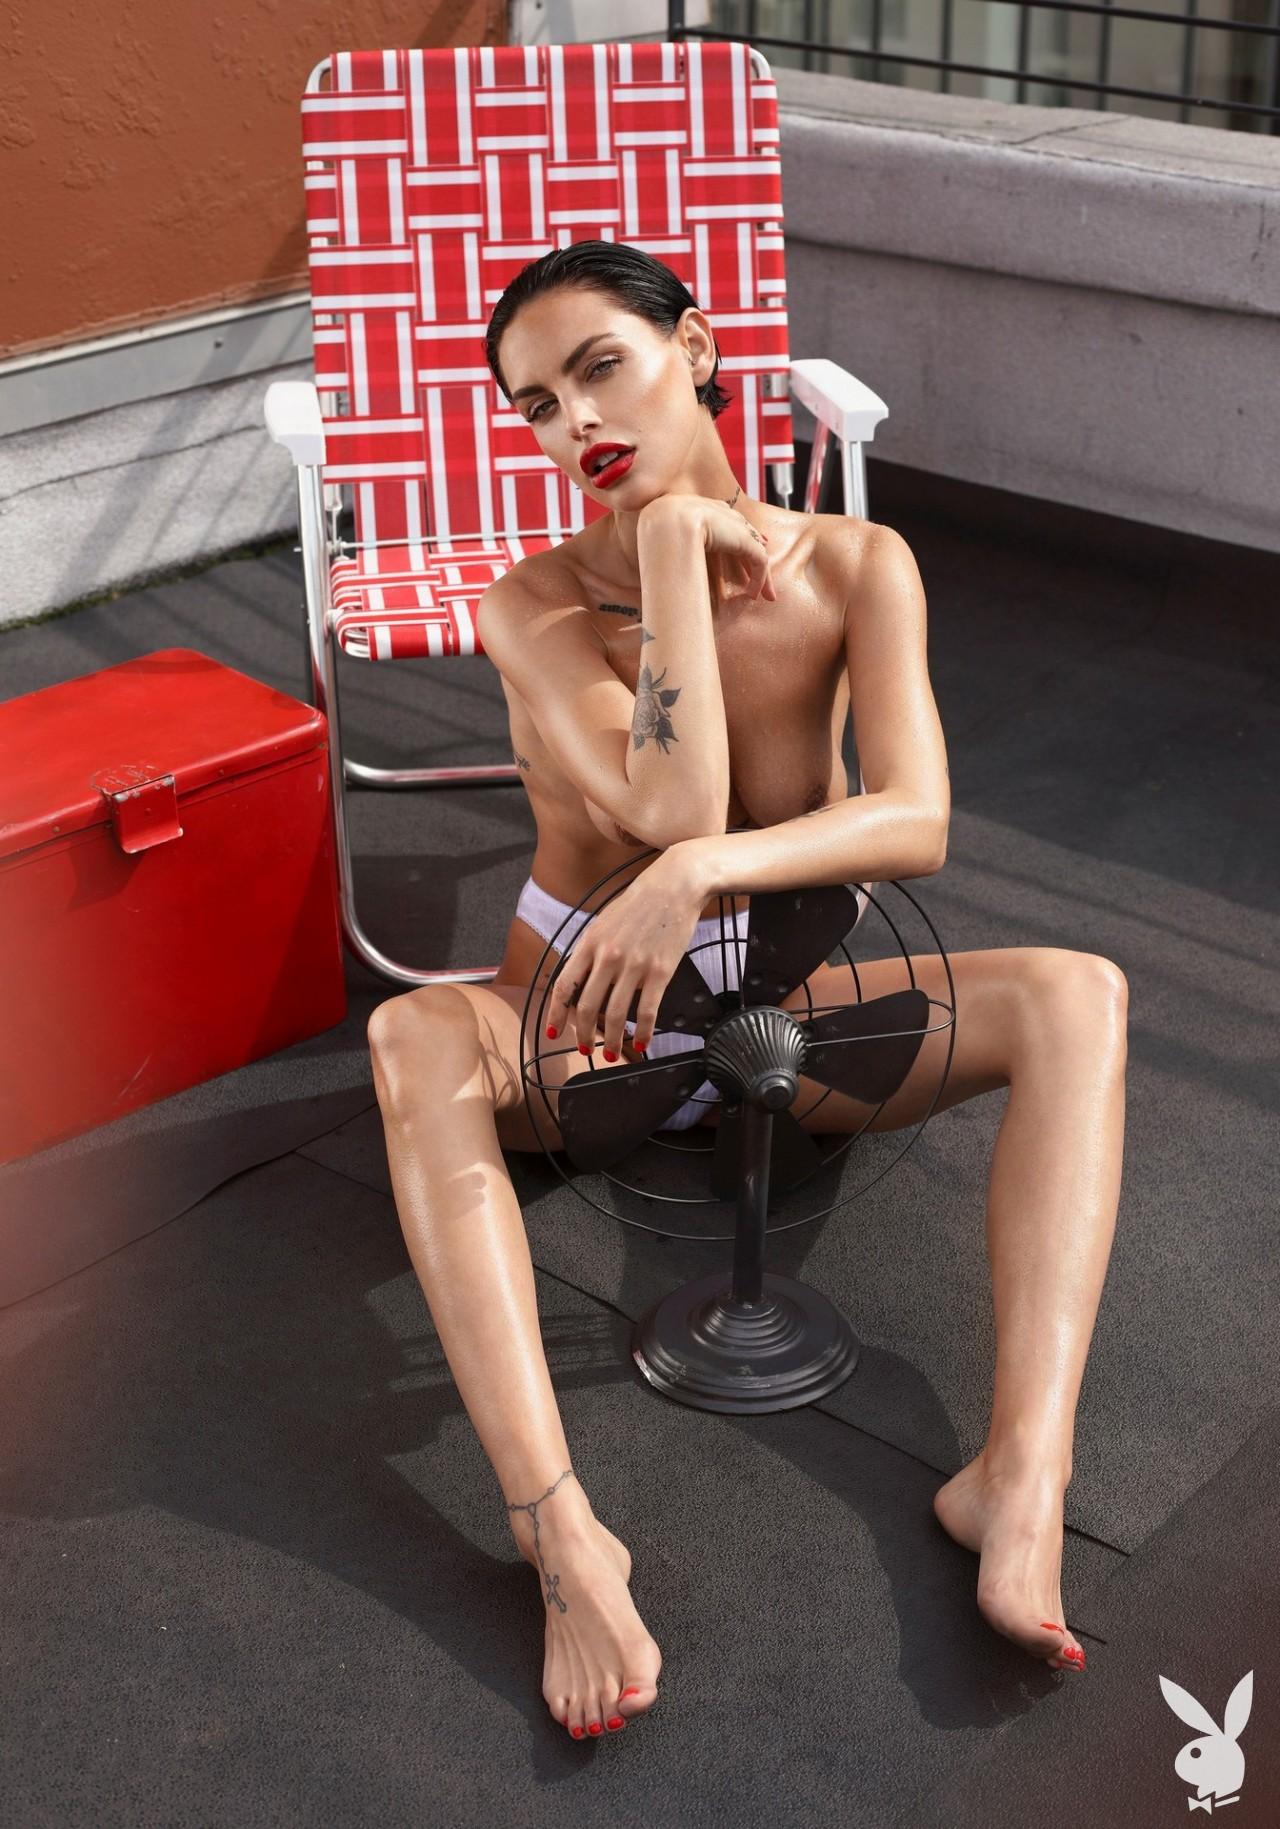 Playmate July 2019 Teela Laroux Playboy Plus (12)